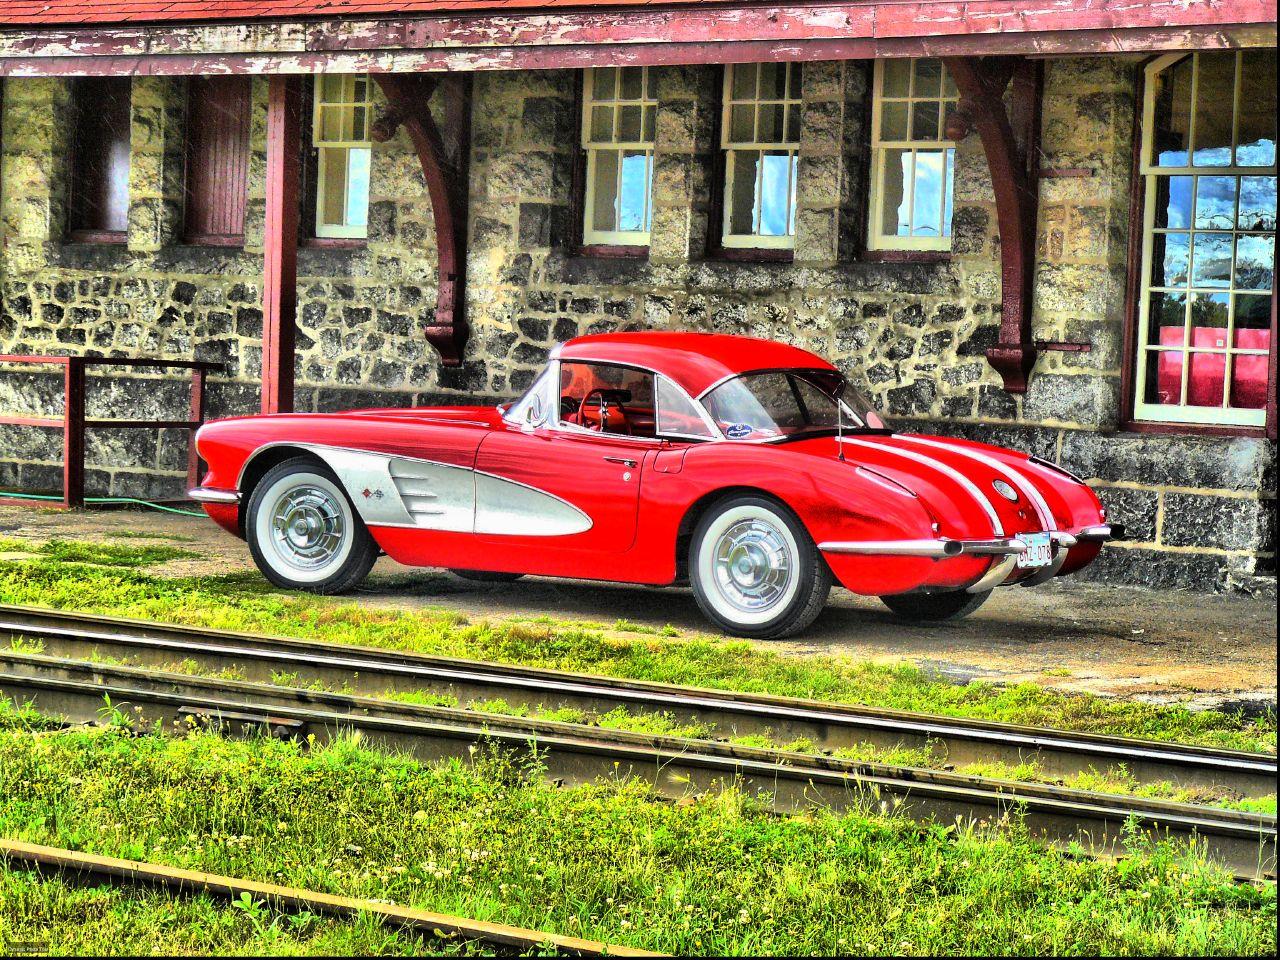 Alfred's 58 Corvette roadster